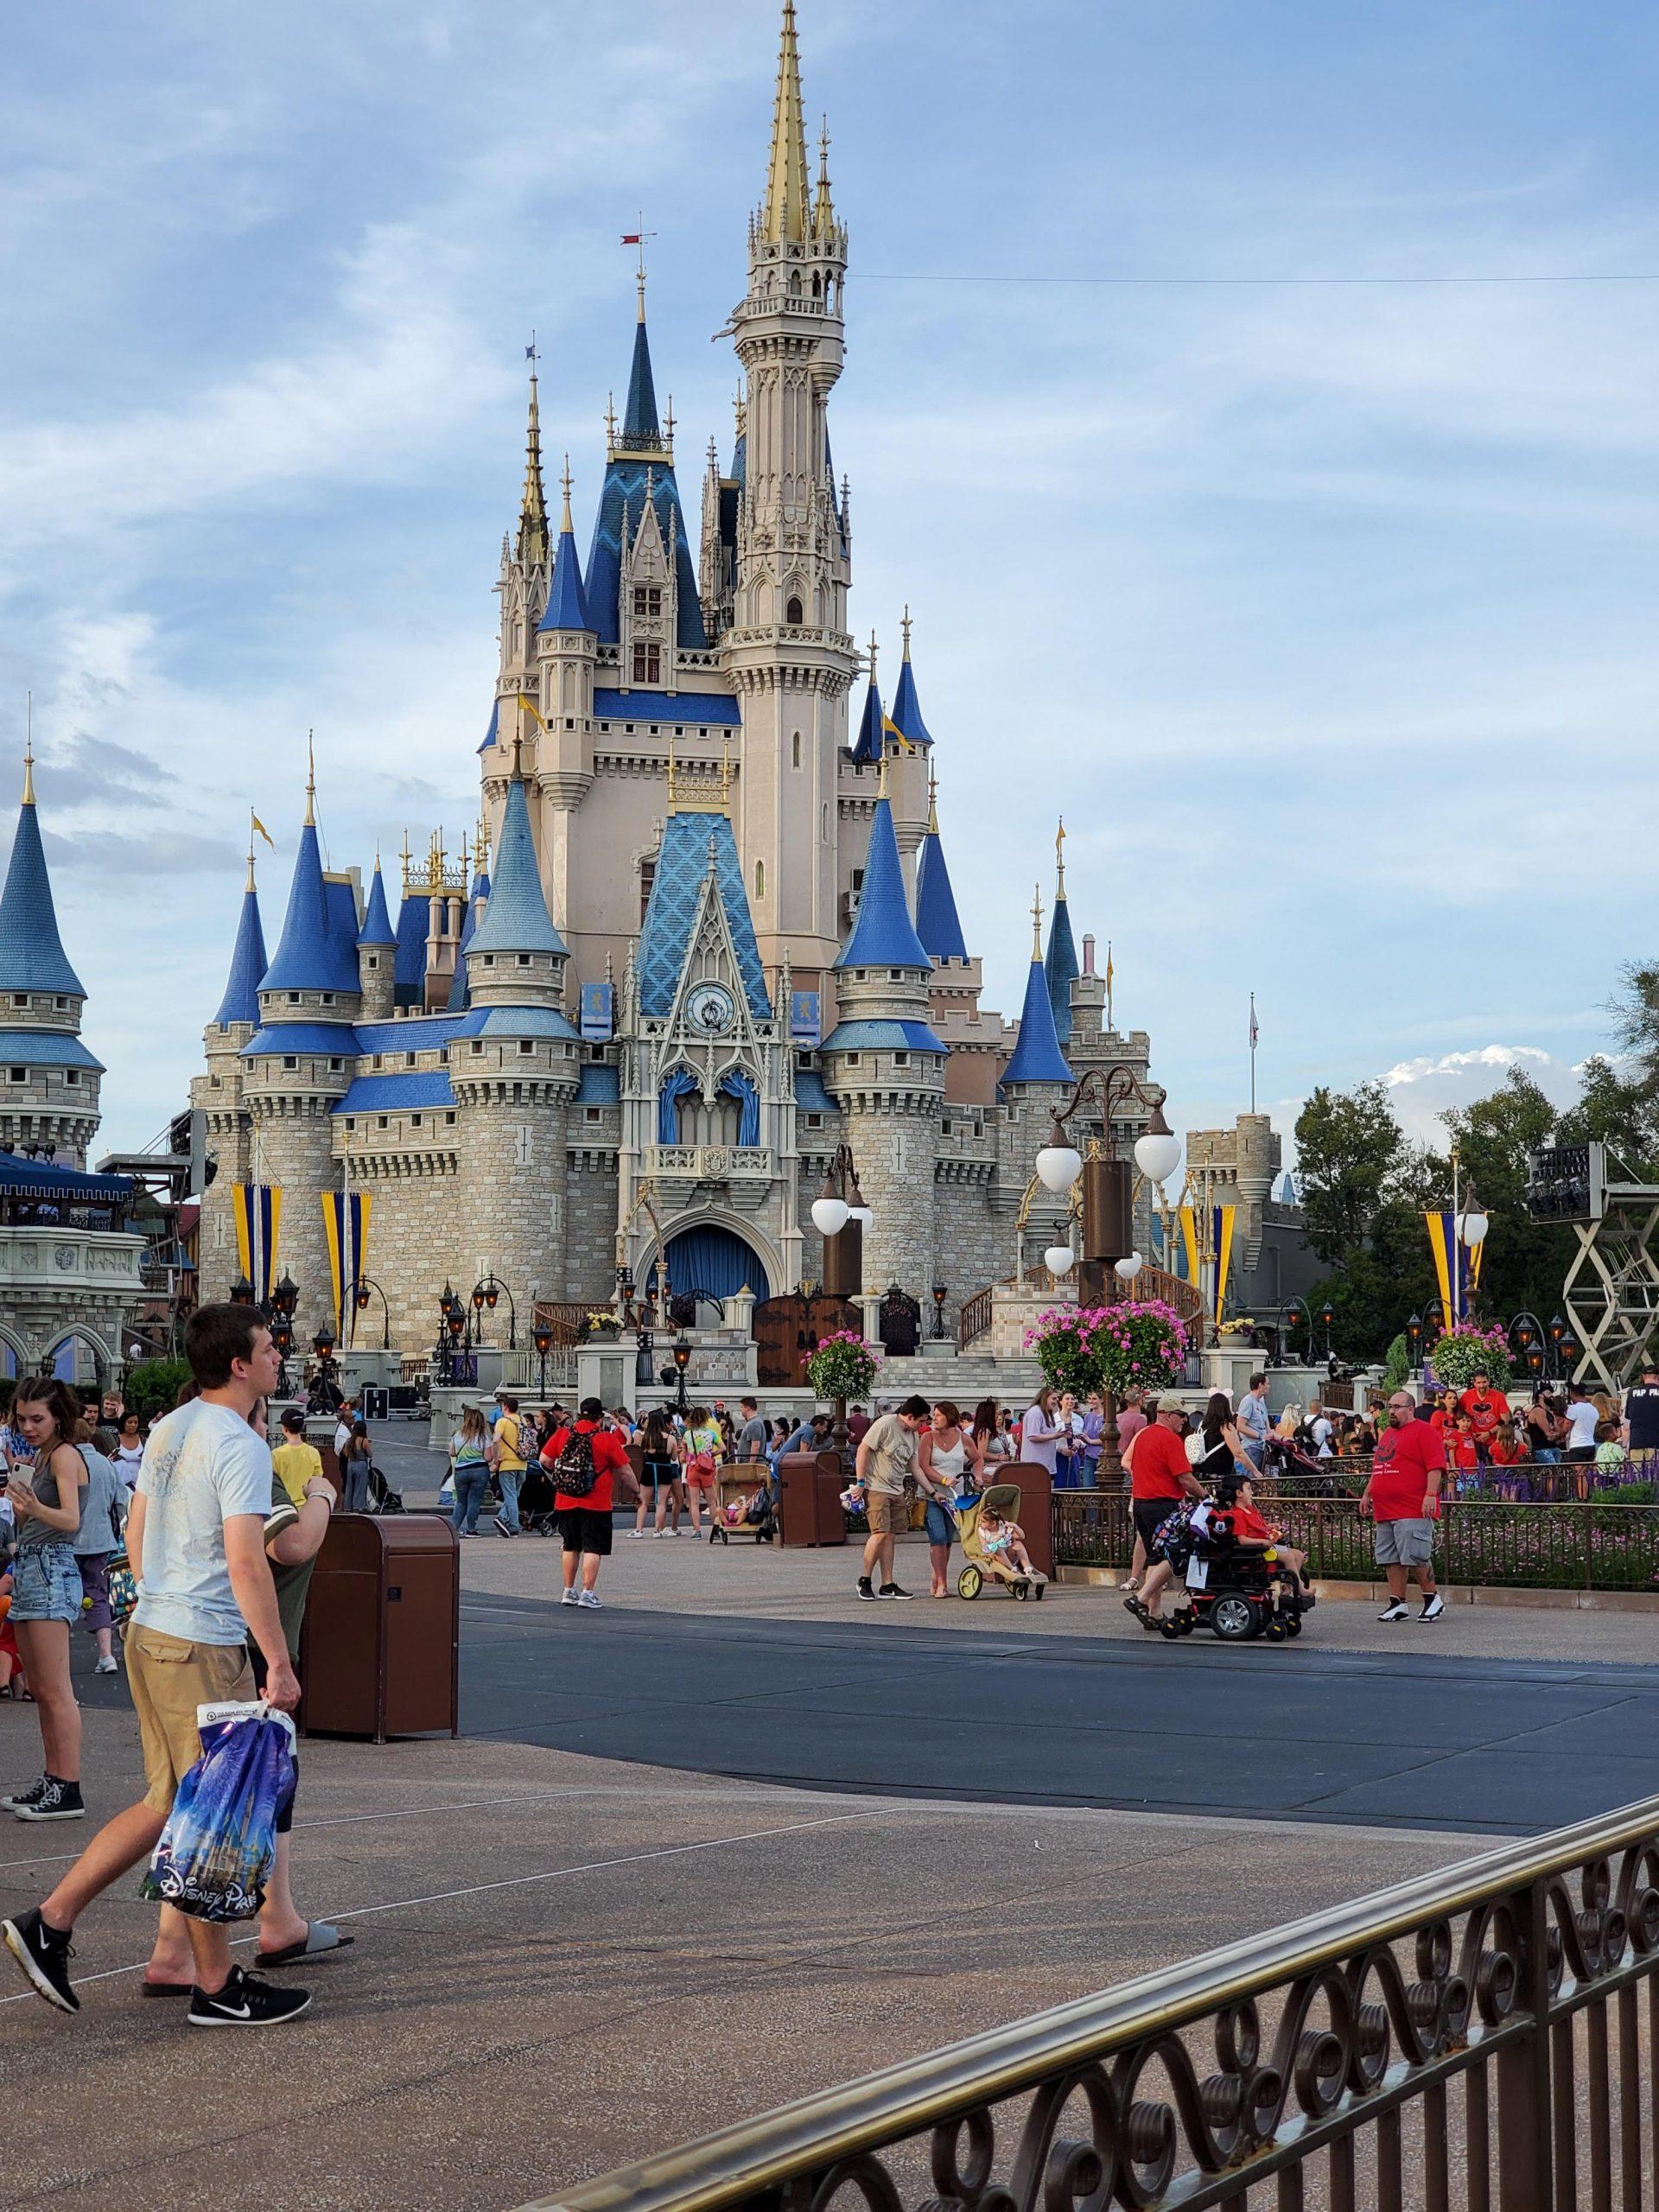 Disney planning now